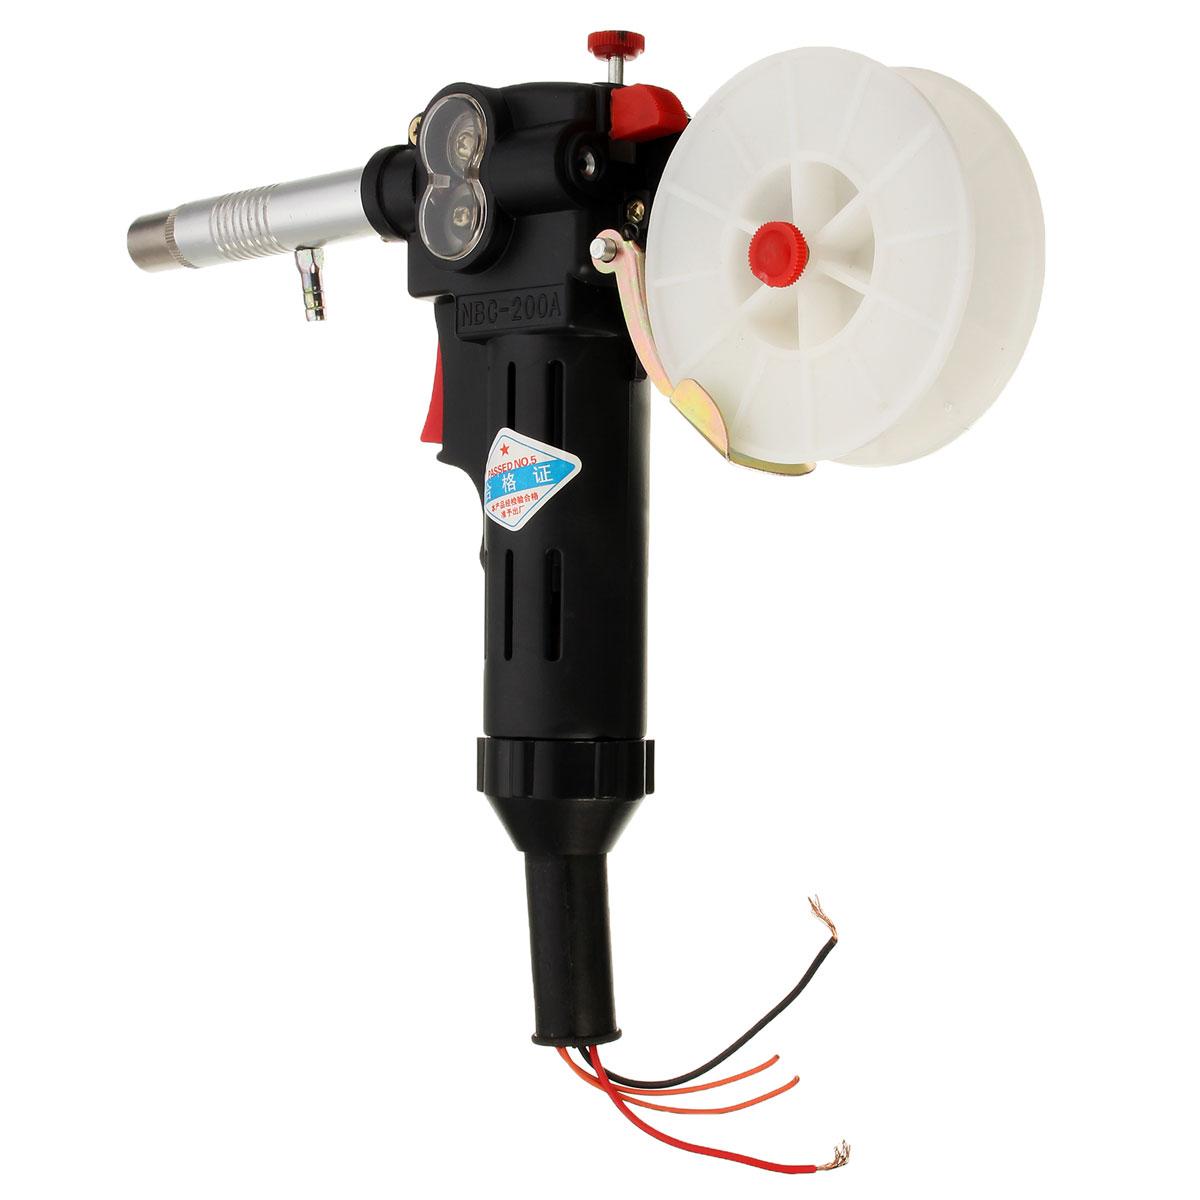 180A Miller MIG Spool Gun Push Pull Feeder Aluminum Welding Torch ...